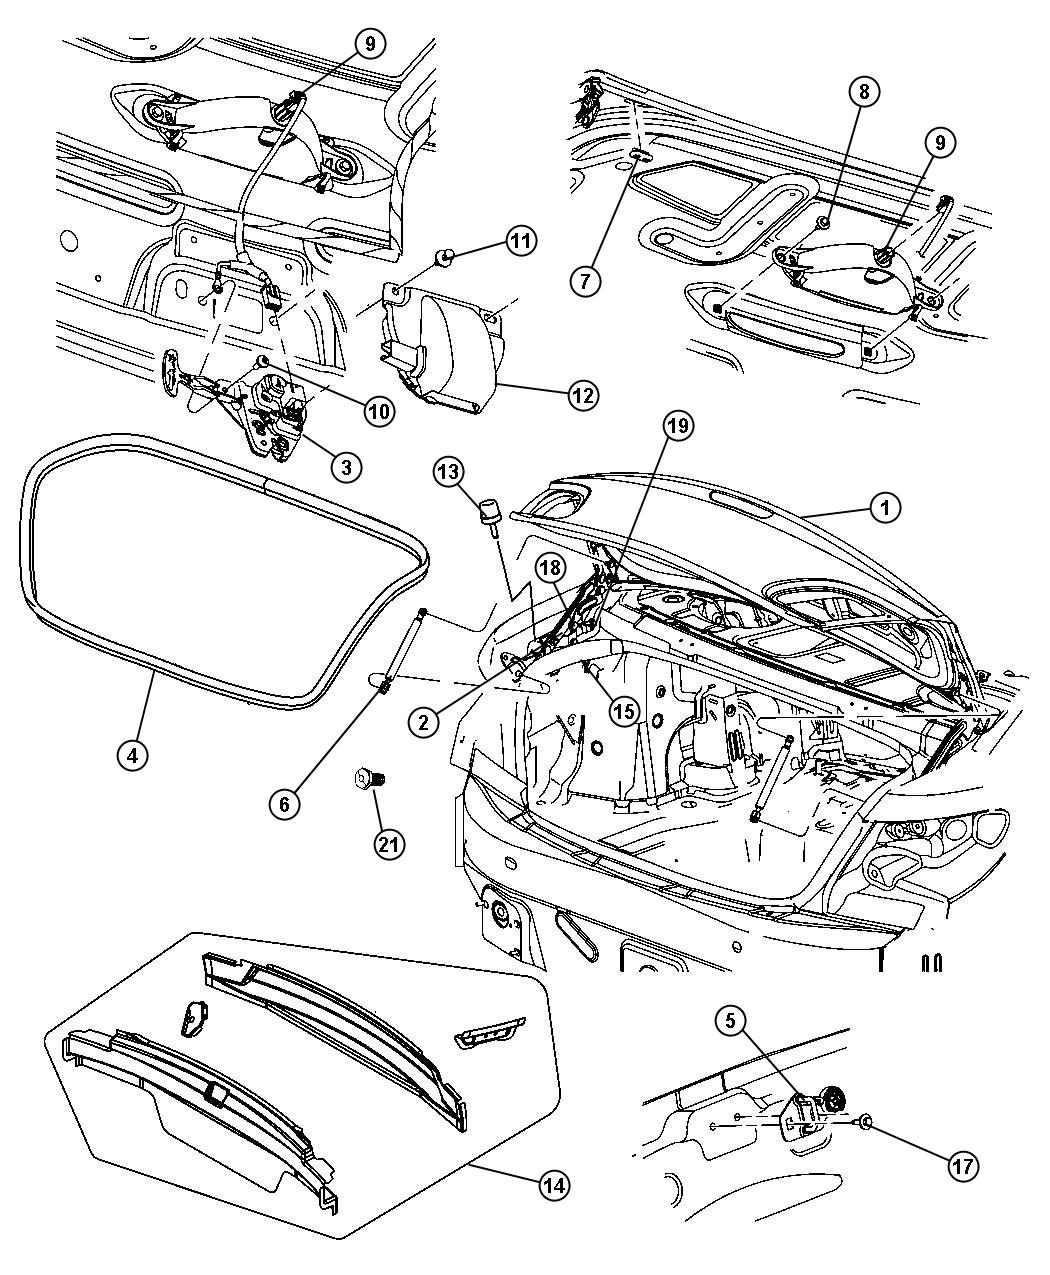 2008 Chrysler Sebring Latch. Decklid. Related, release